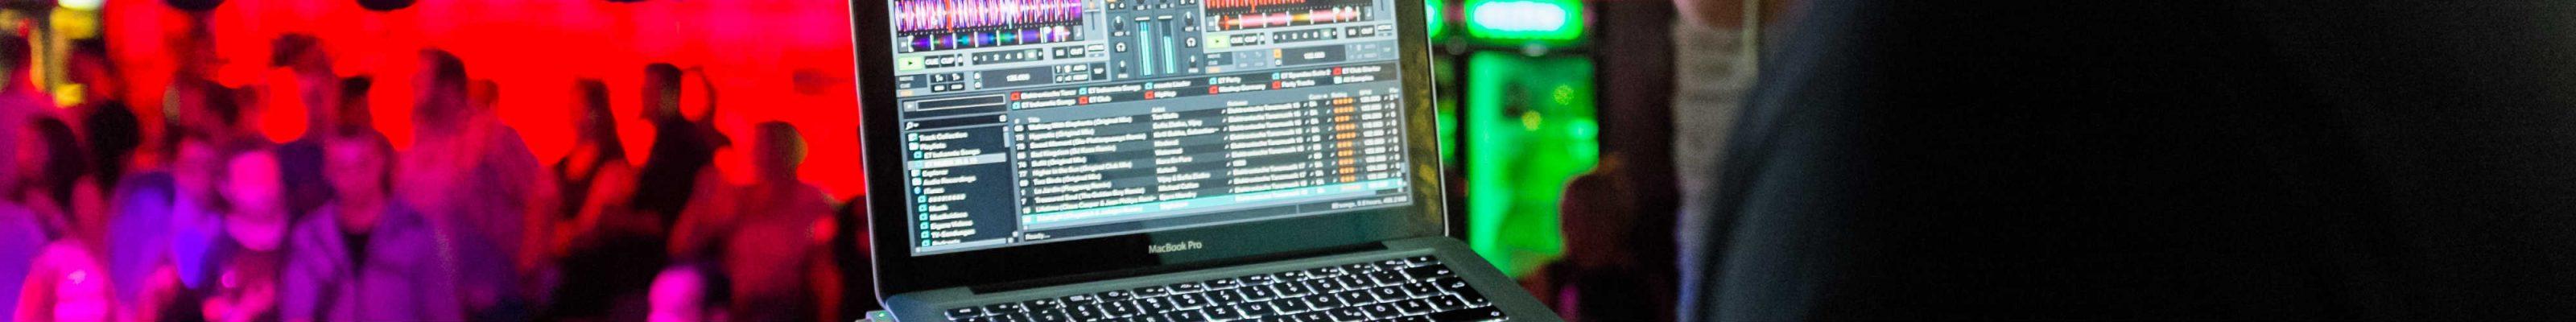 A DJ playing in a nightclub